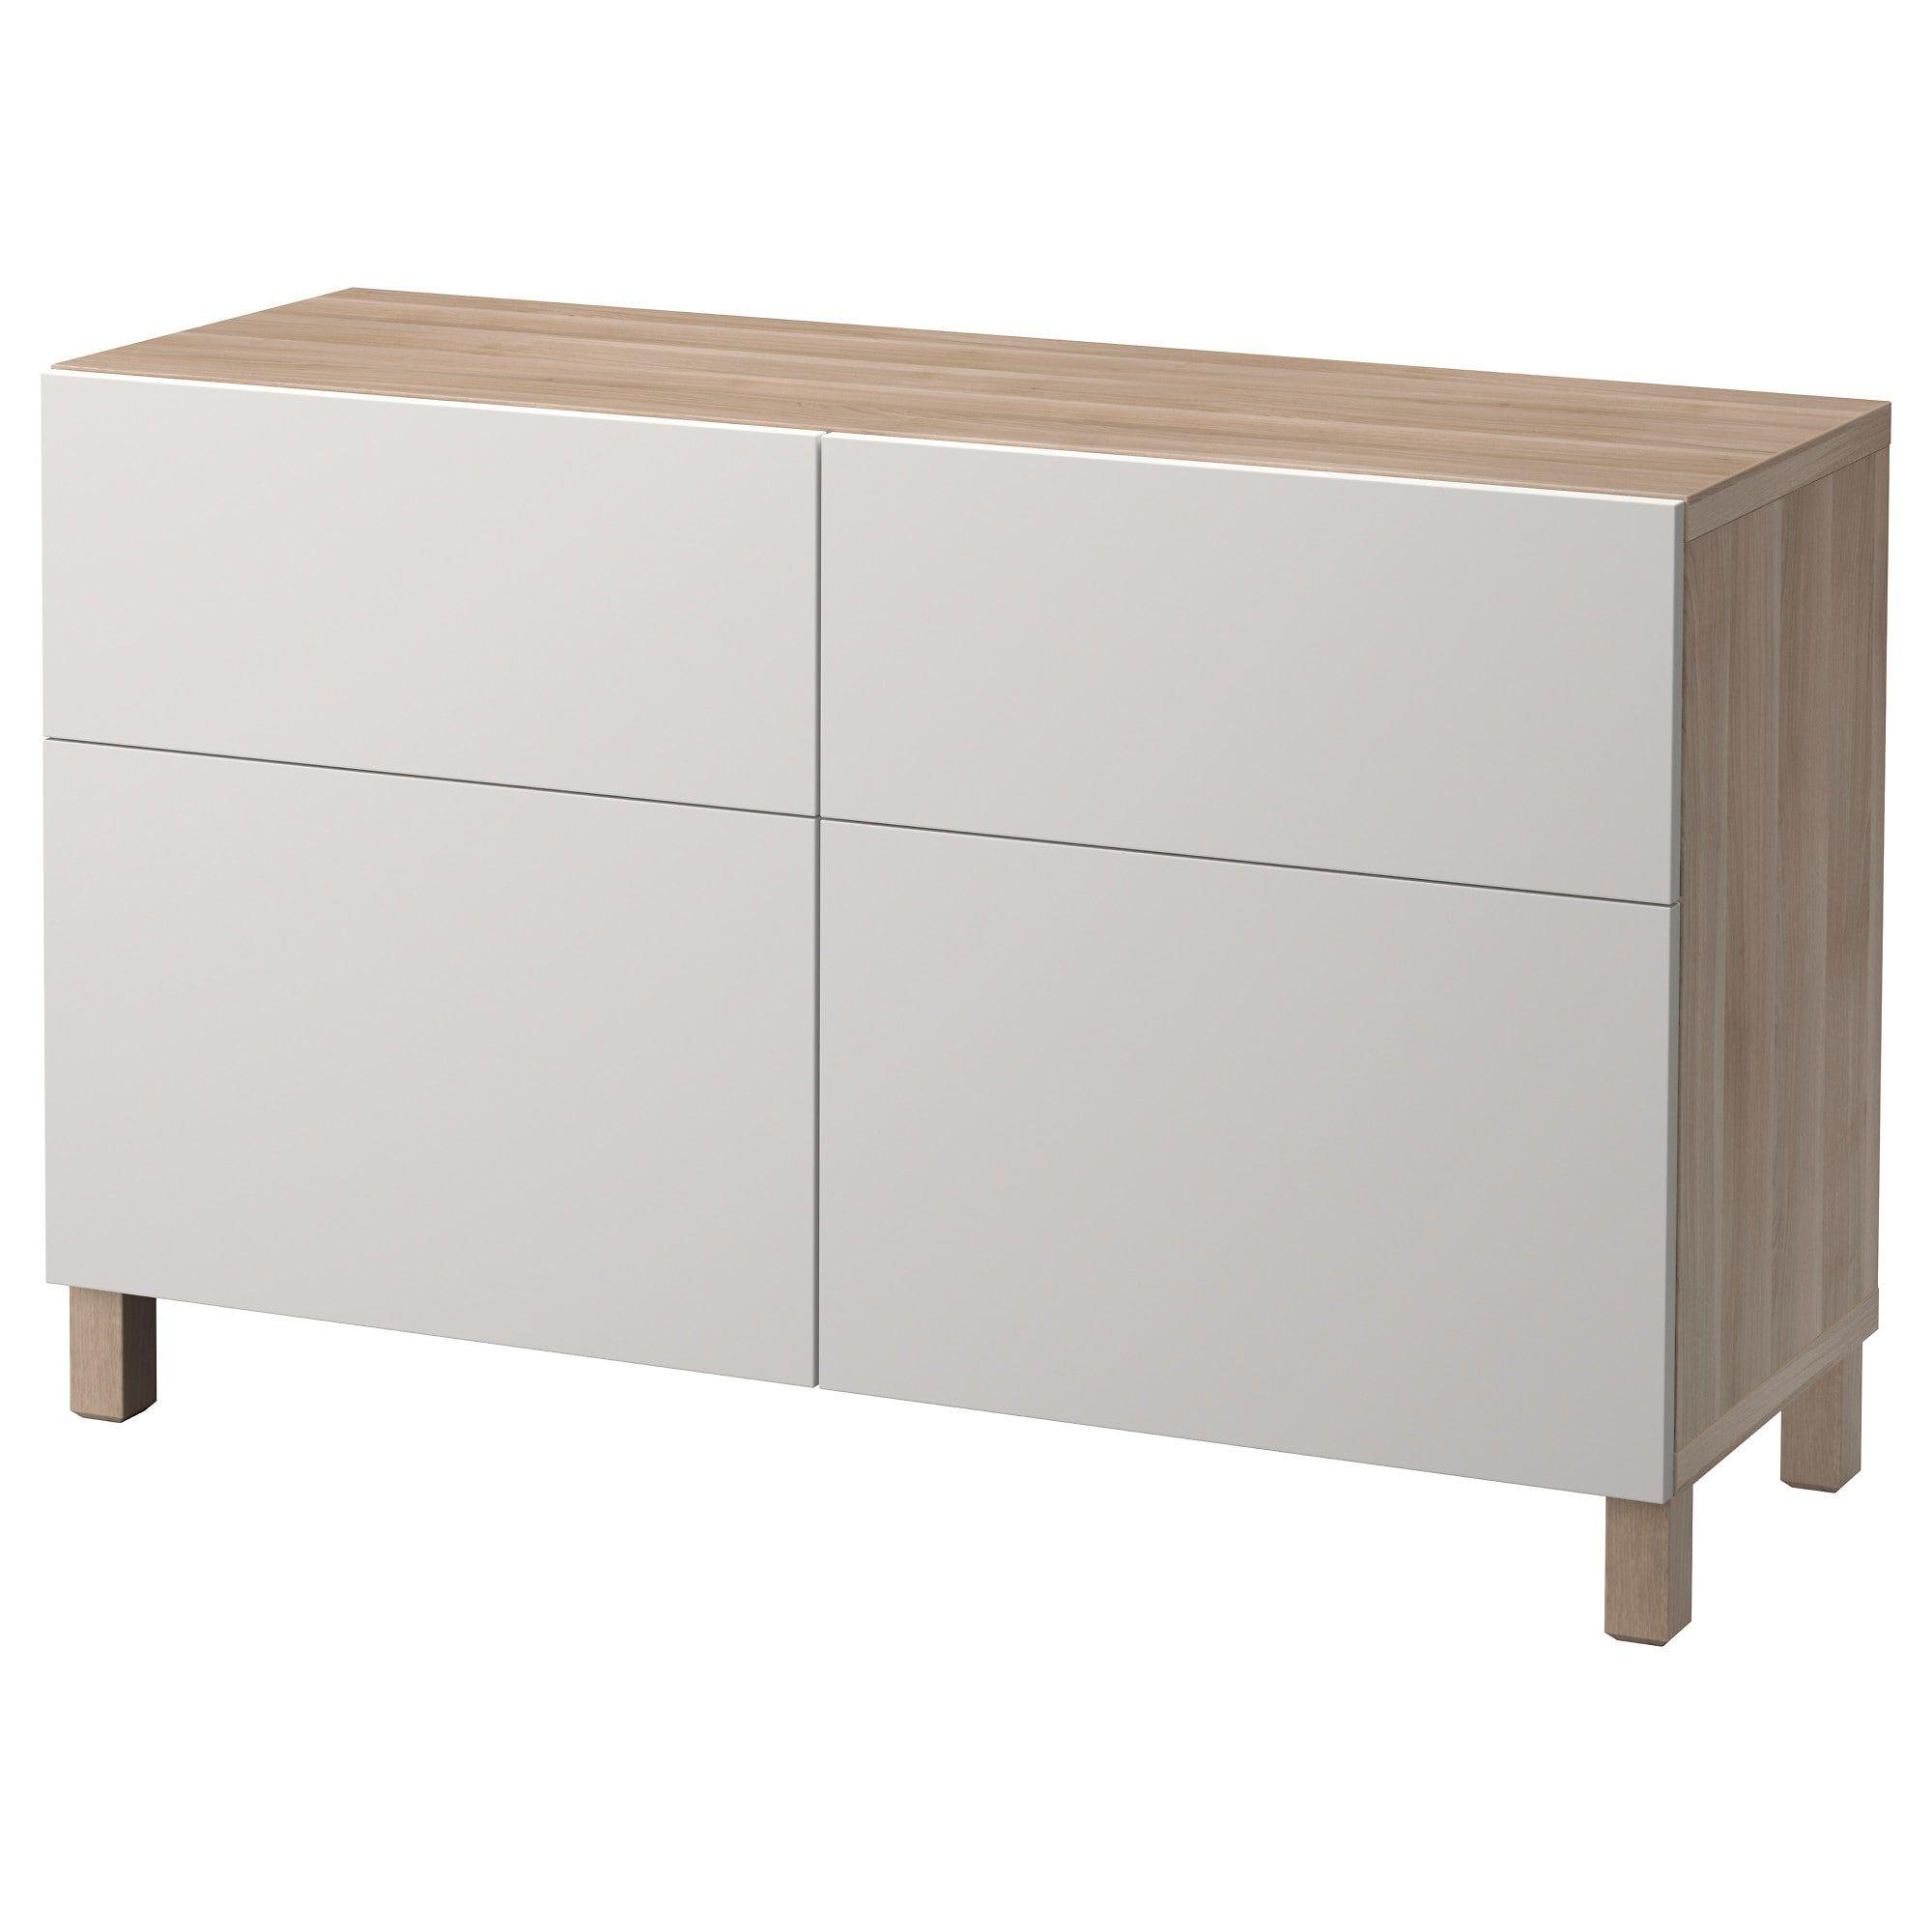 Besta Storage Combination W Doors Drawers Walnut Effect Light Gray Lappviken Light Gray 47 1 4x15 3 4x29 1 8 In 2020 Ikea Living Storage Drawers